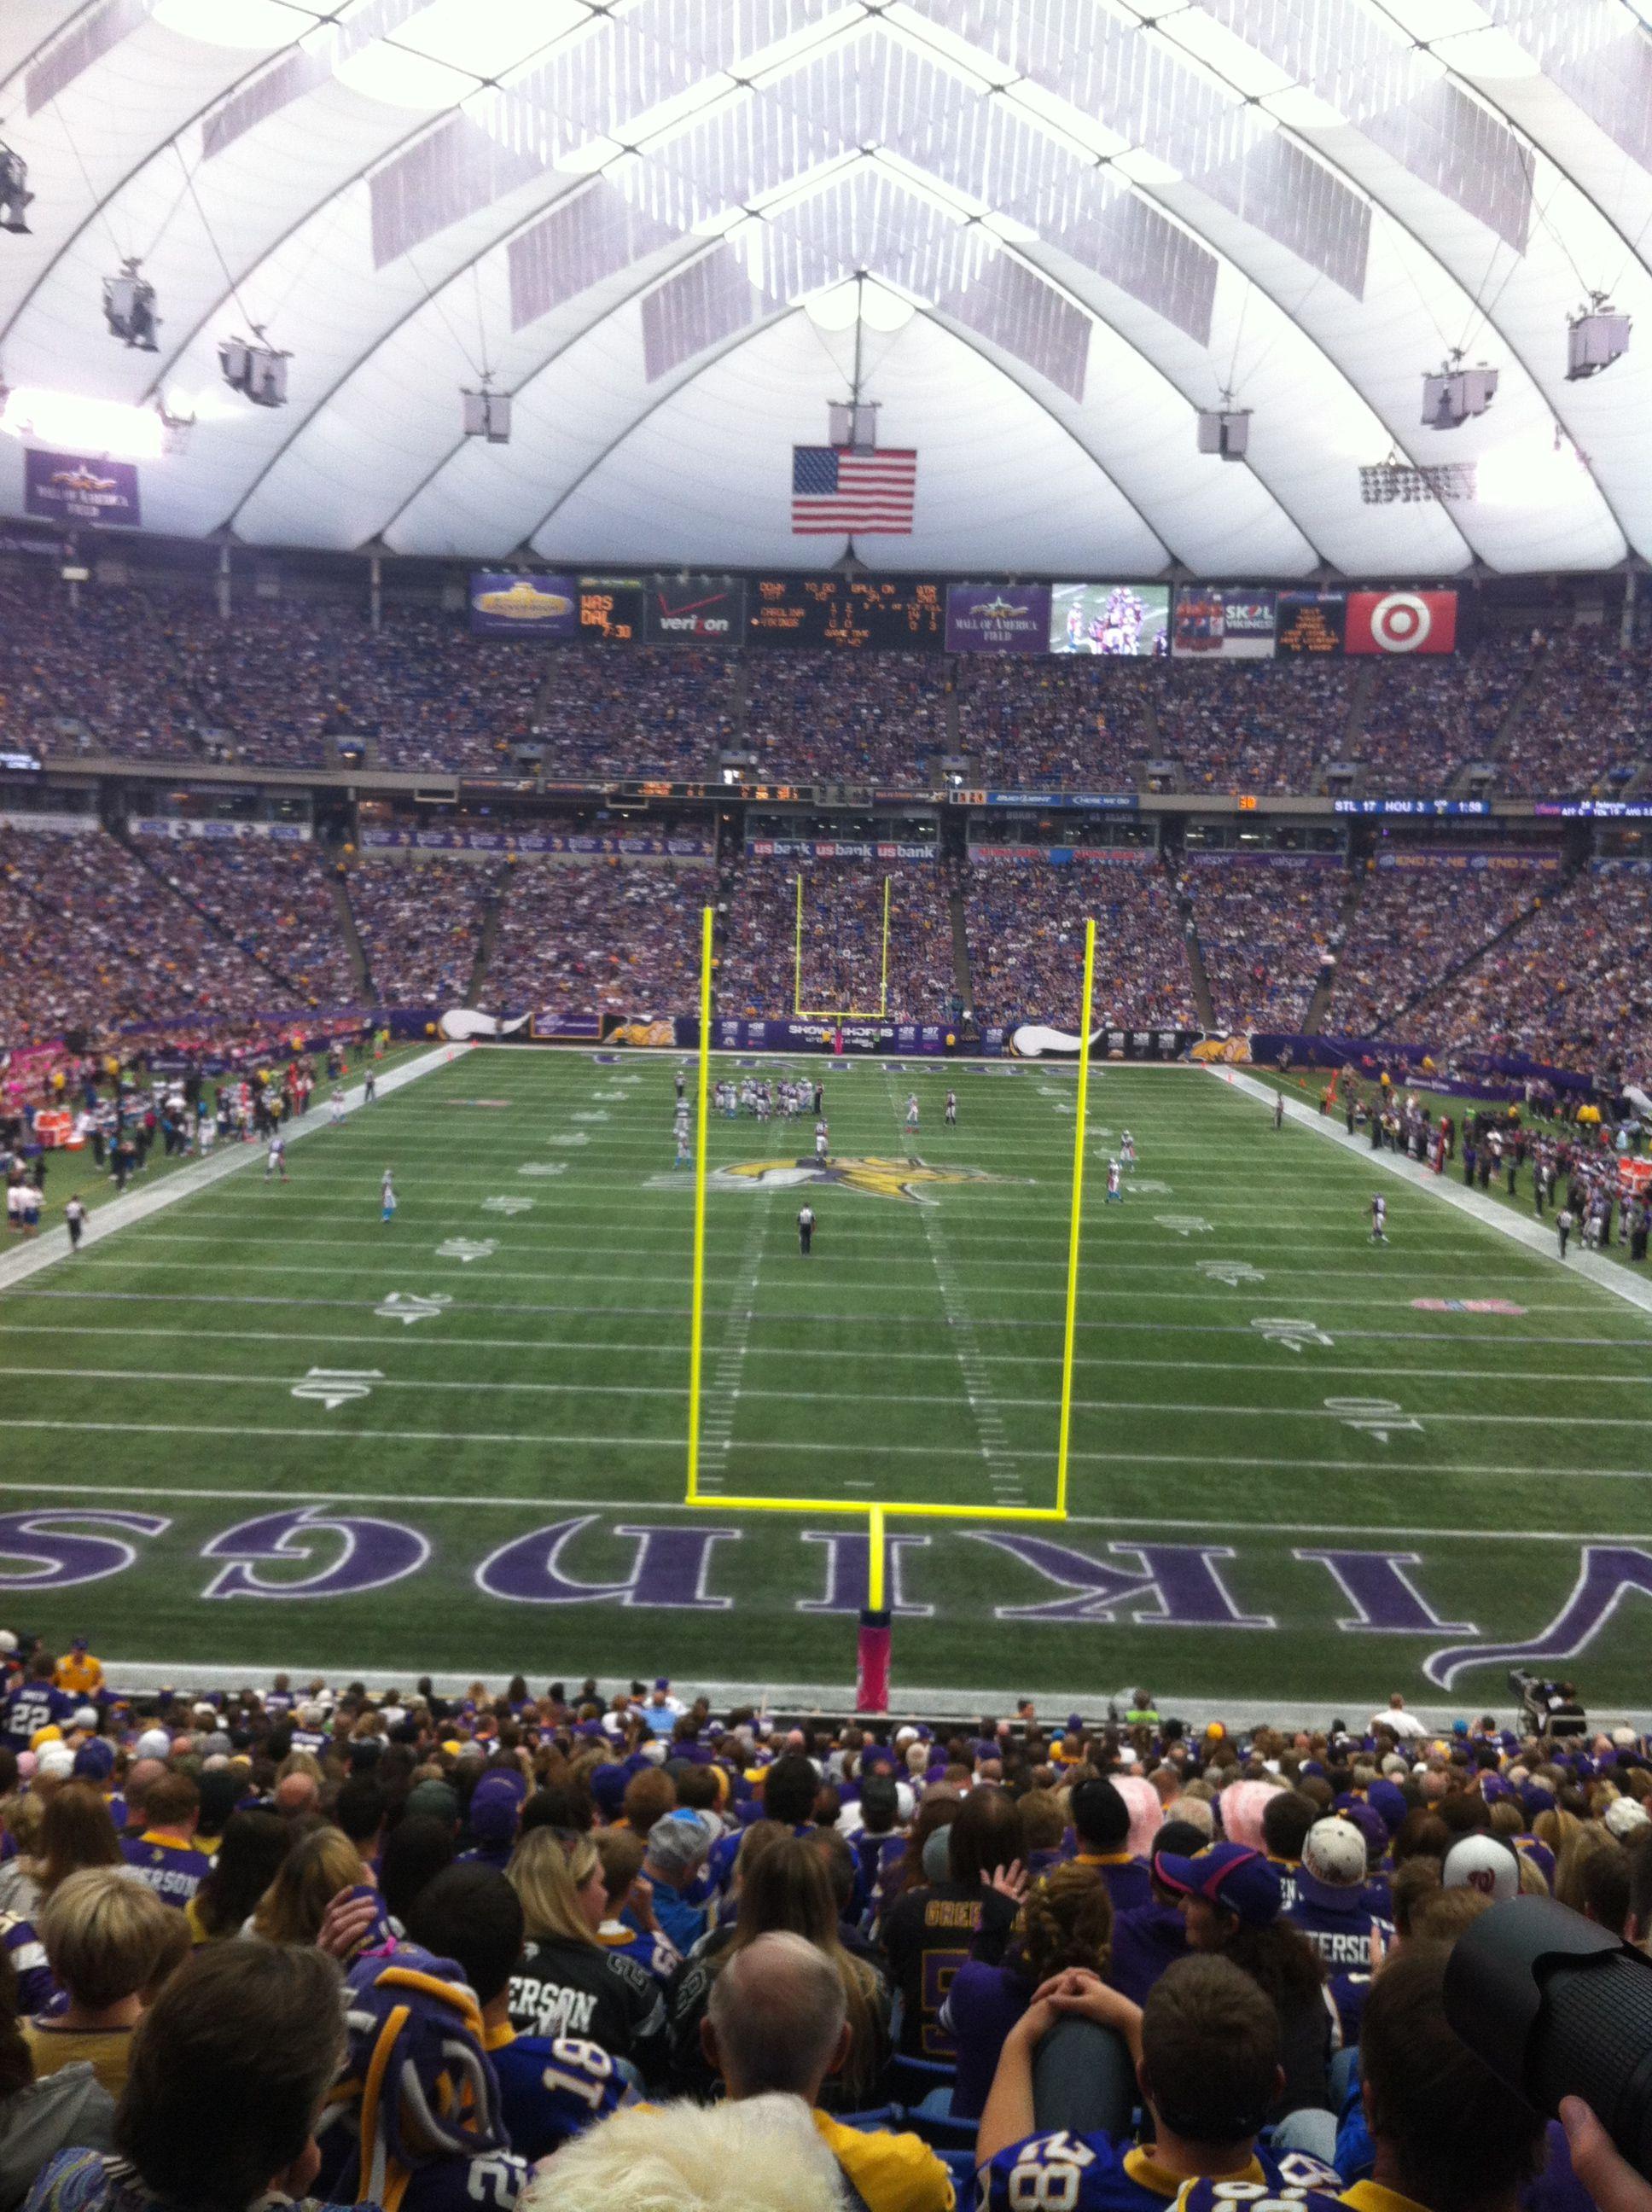 Pin By Mike Mahoney On Stadiums And Arenas I Have Been To Minnesota Vikings Stadium Minnesota Travel Minnesota Vikings Football